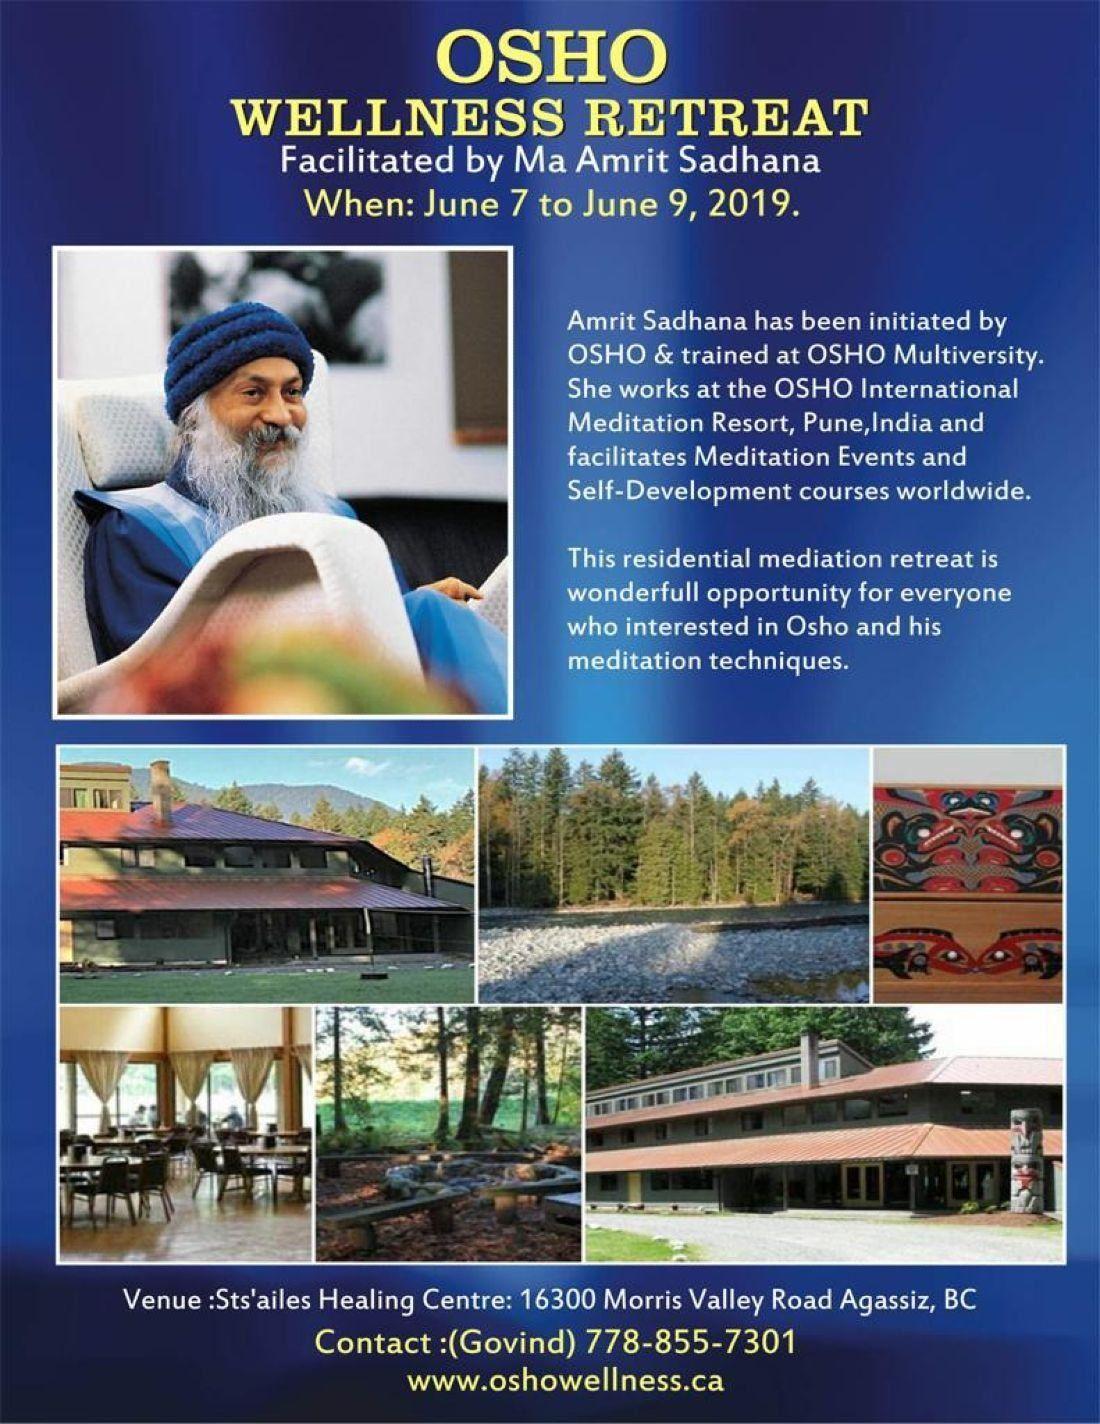 Osho wellness retreat 2019